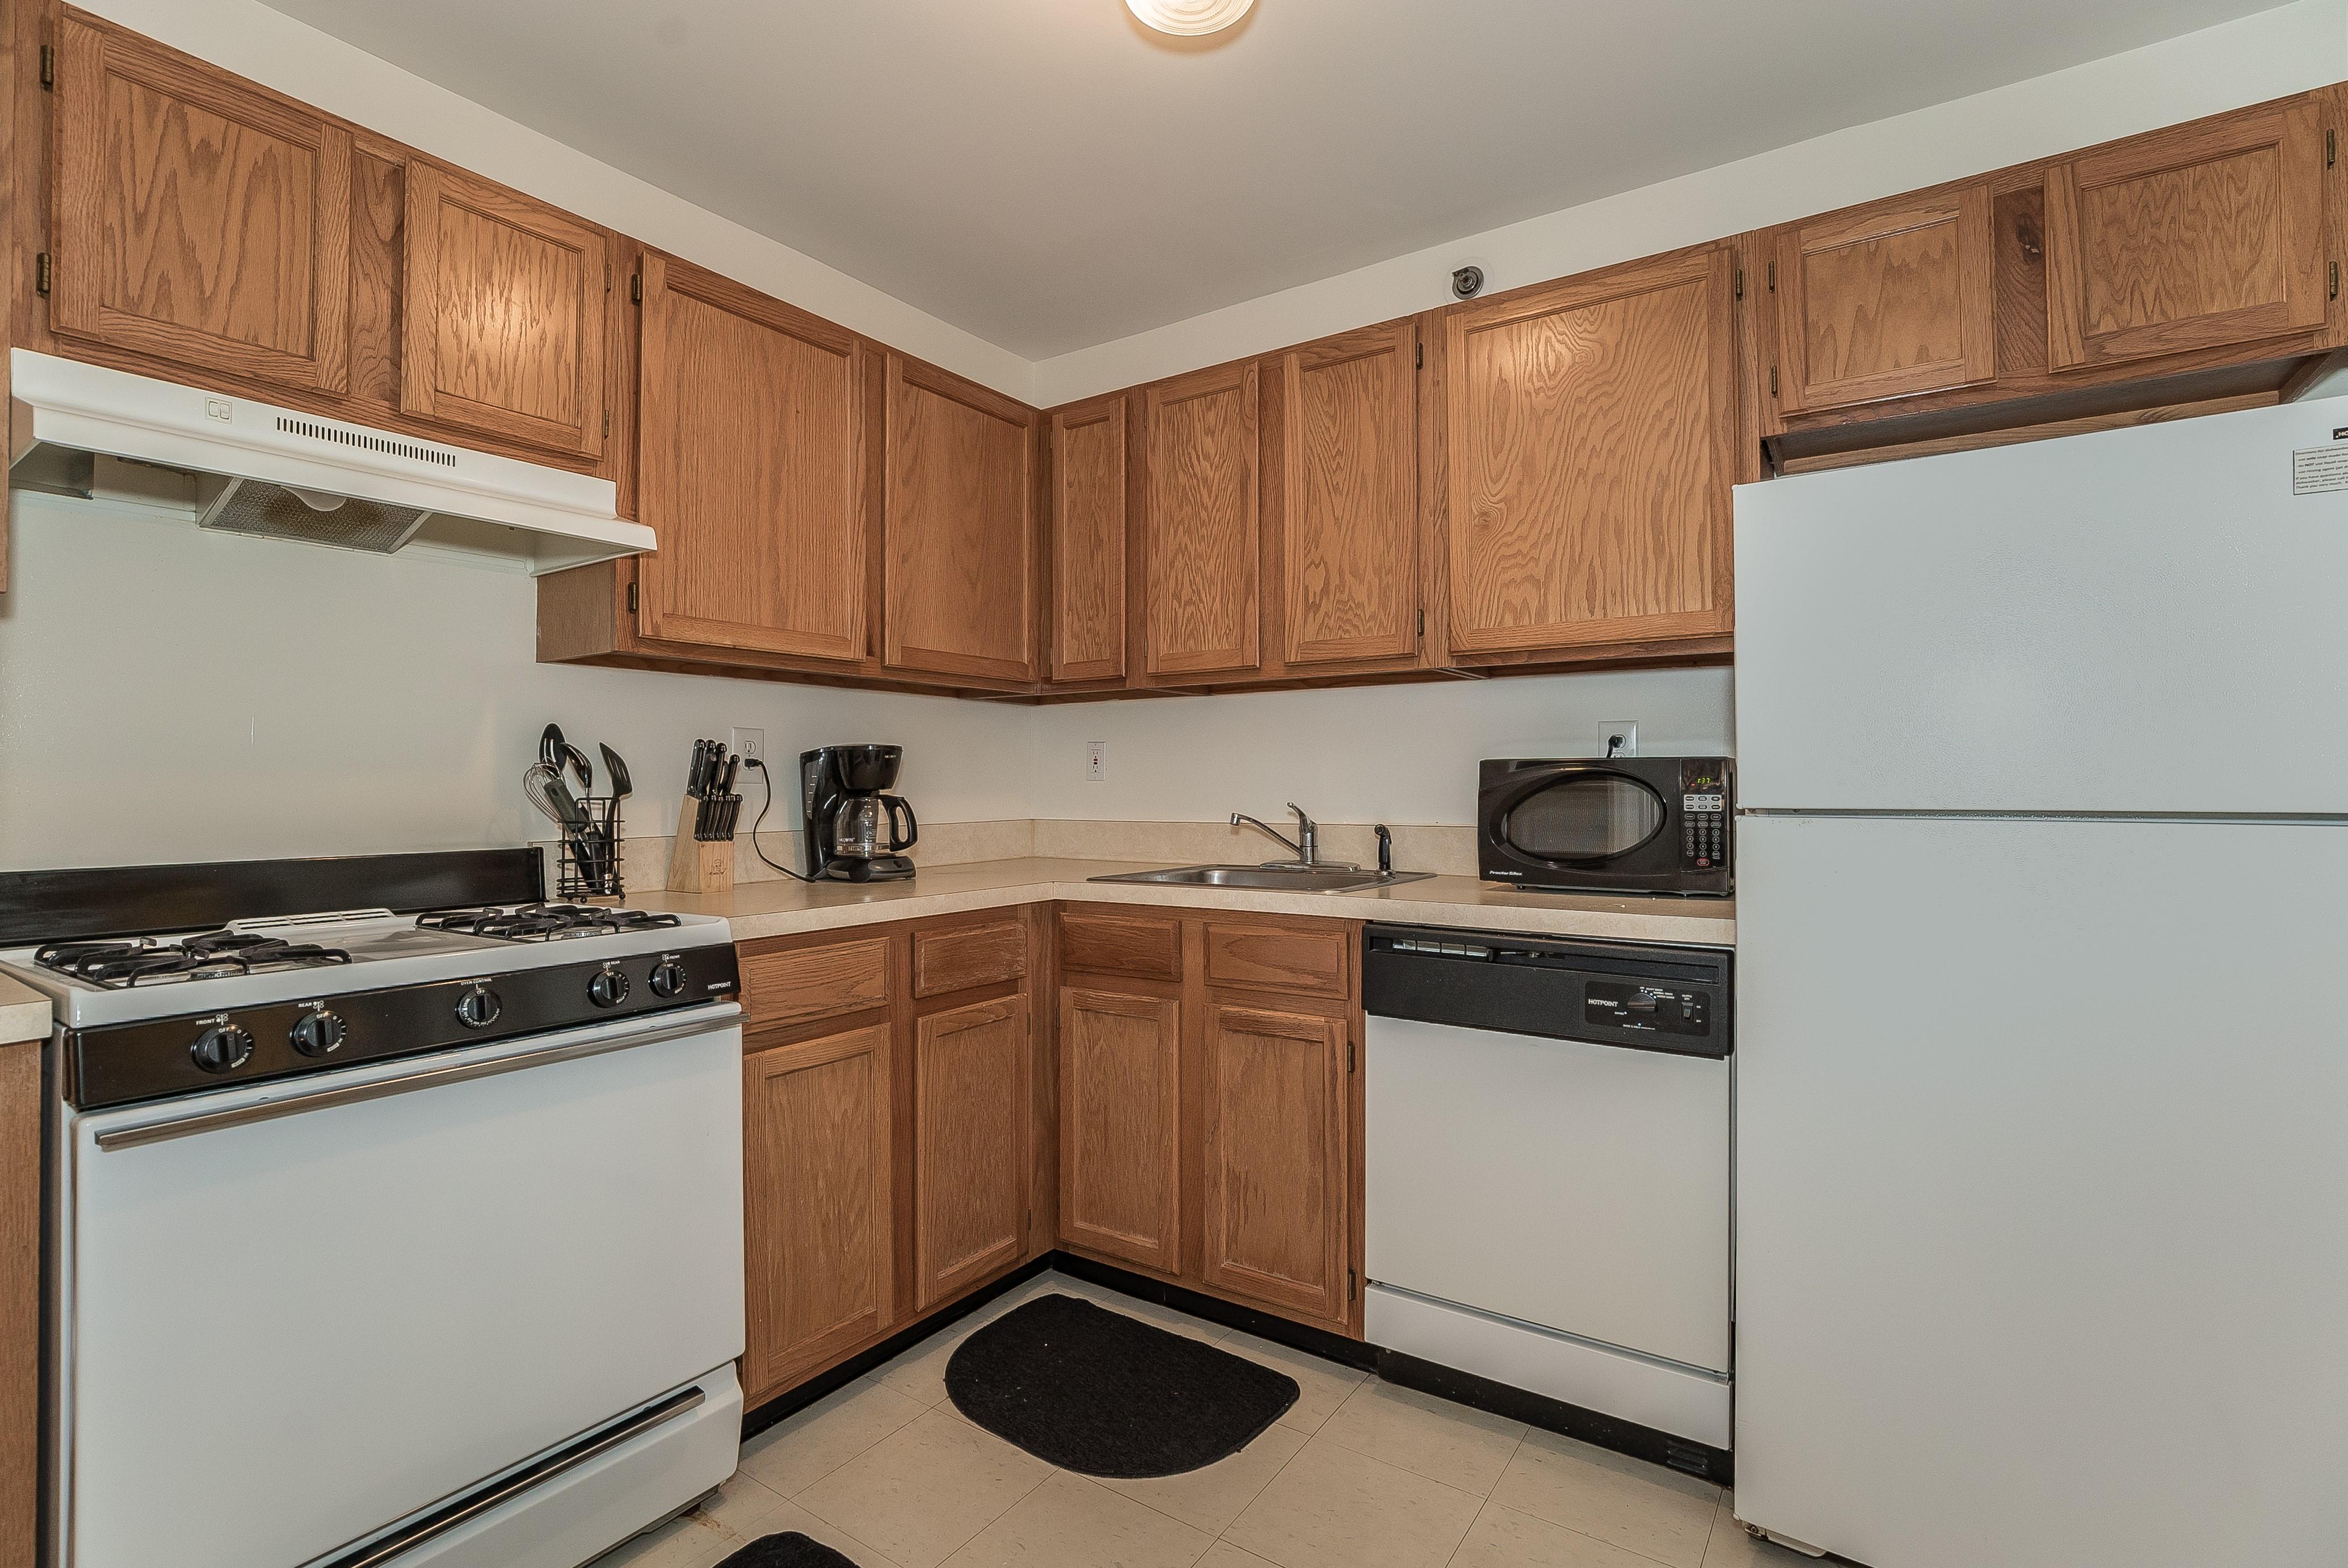 5-Short_Term_Housing_South_Plainfield_724_Kitchen